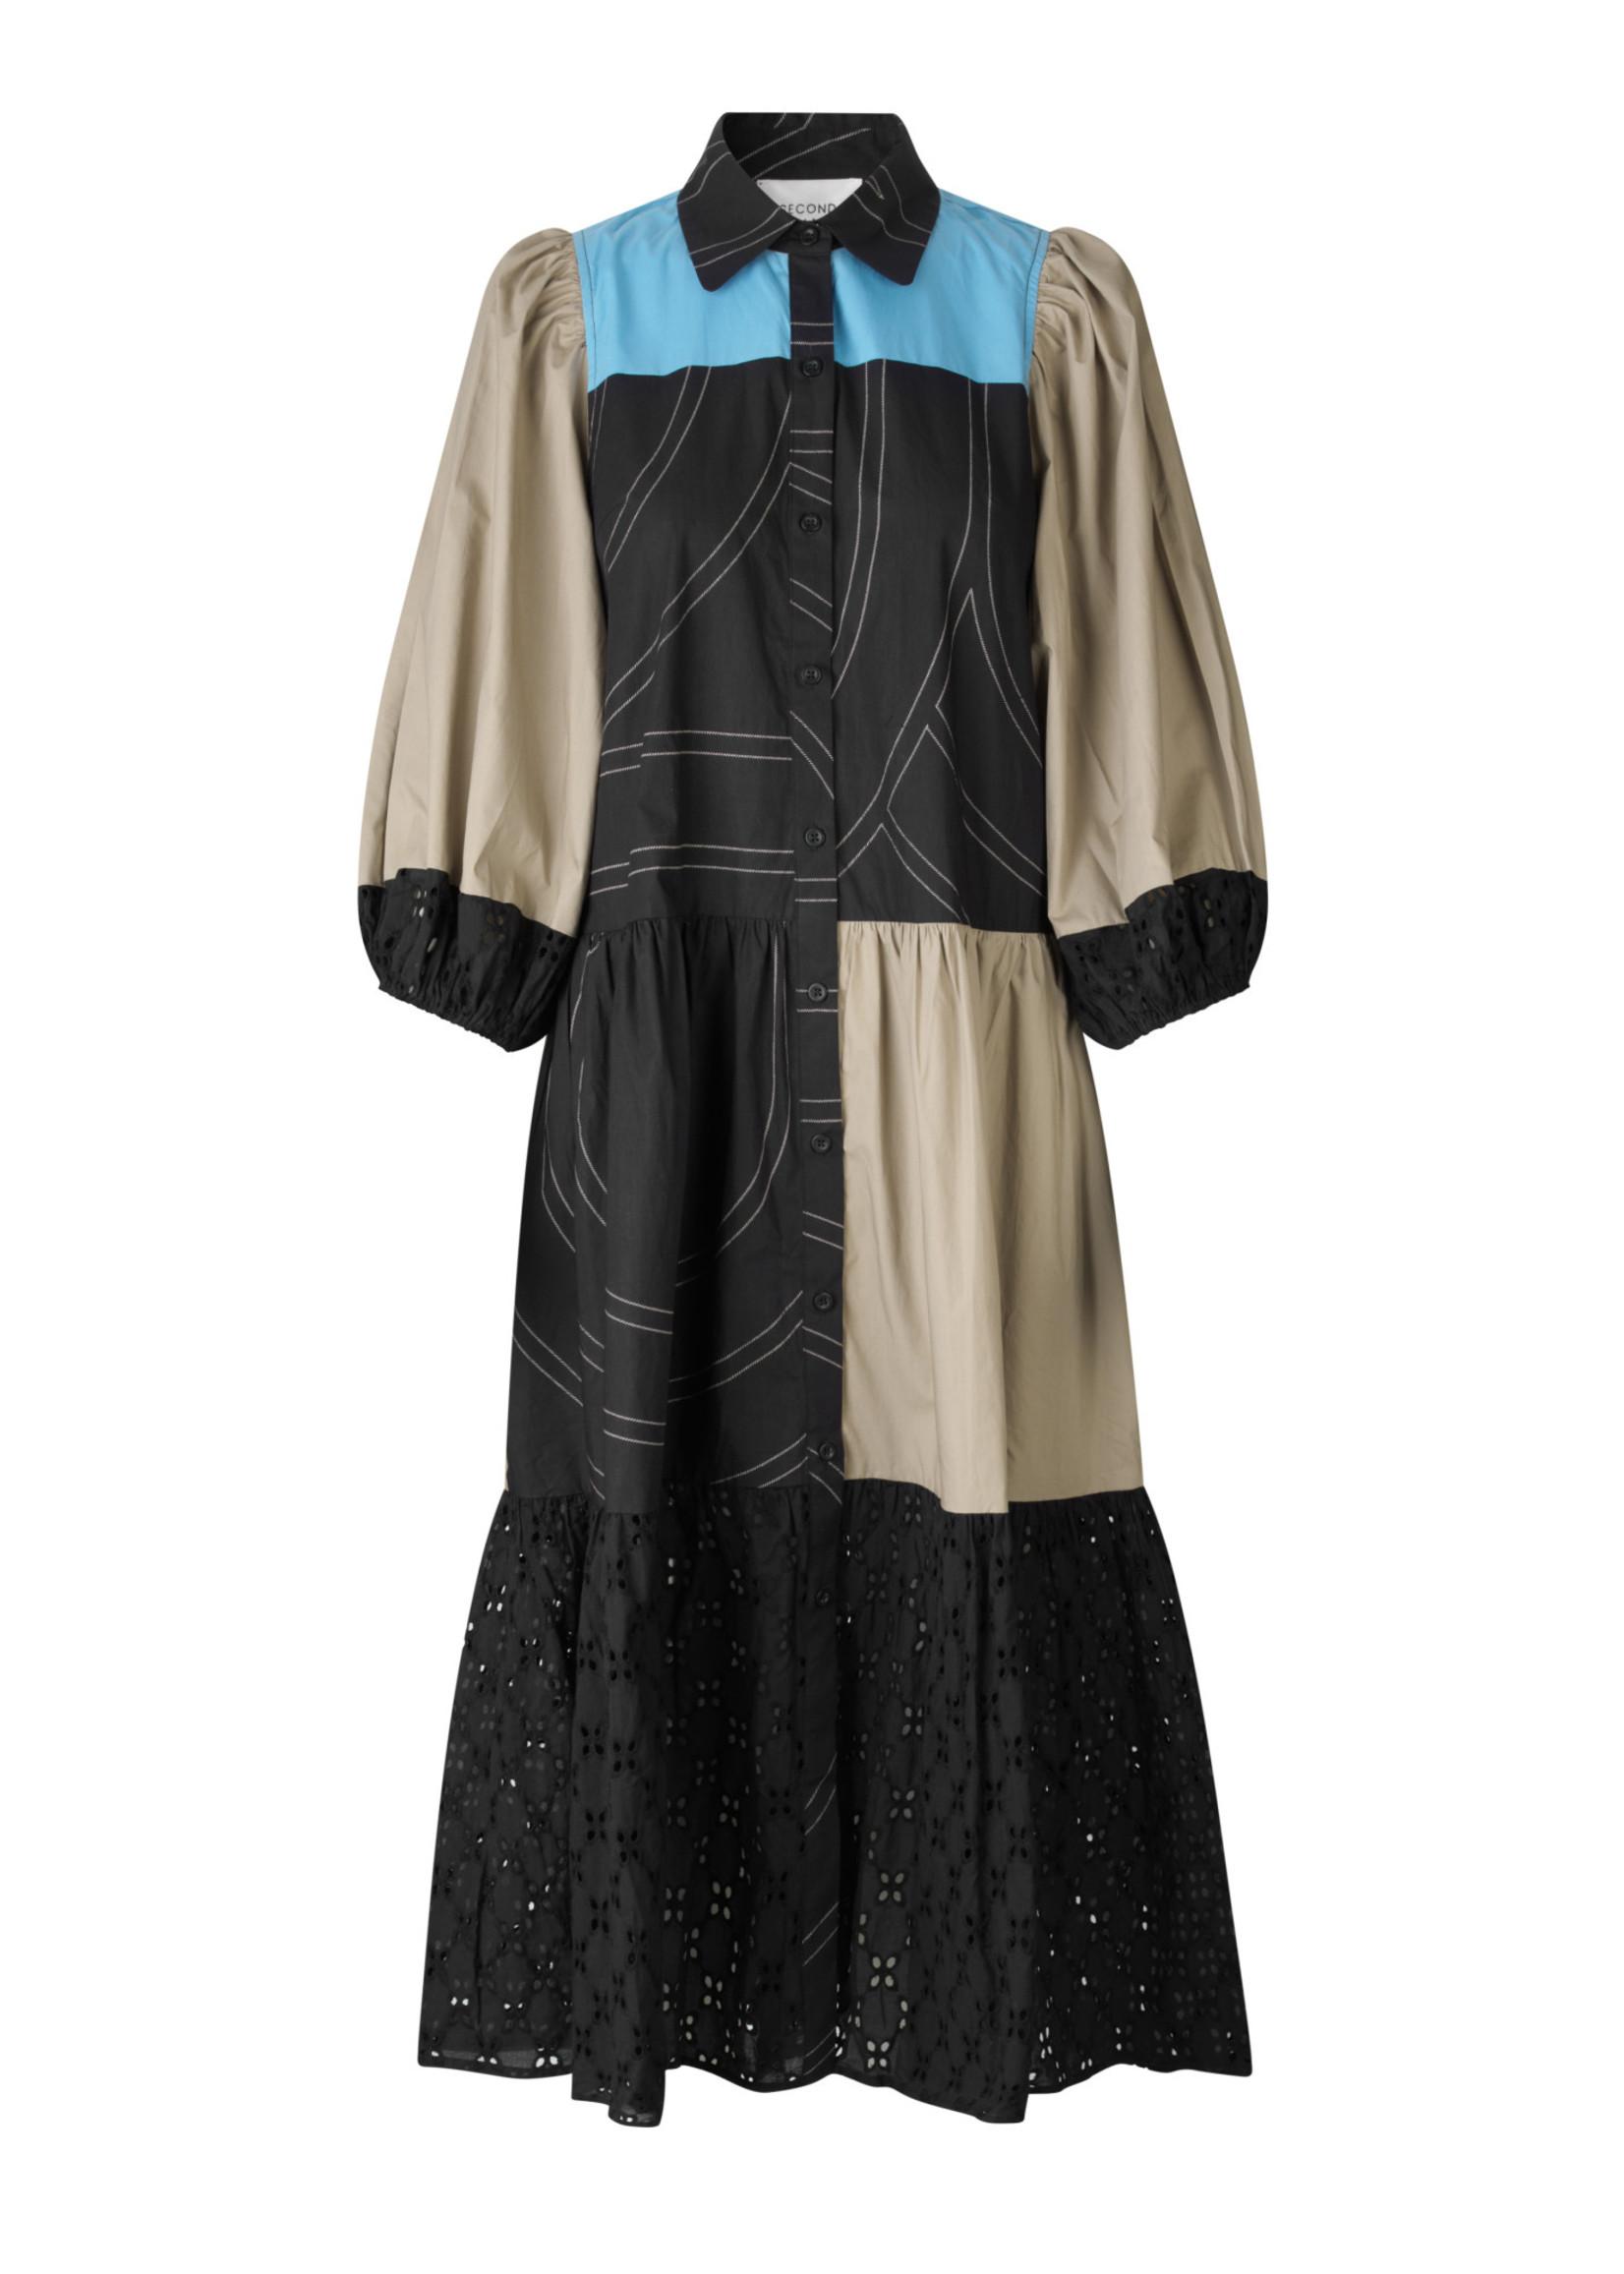 55186 Mix Dakky Dress black